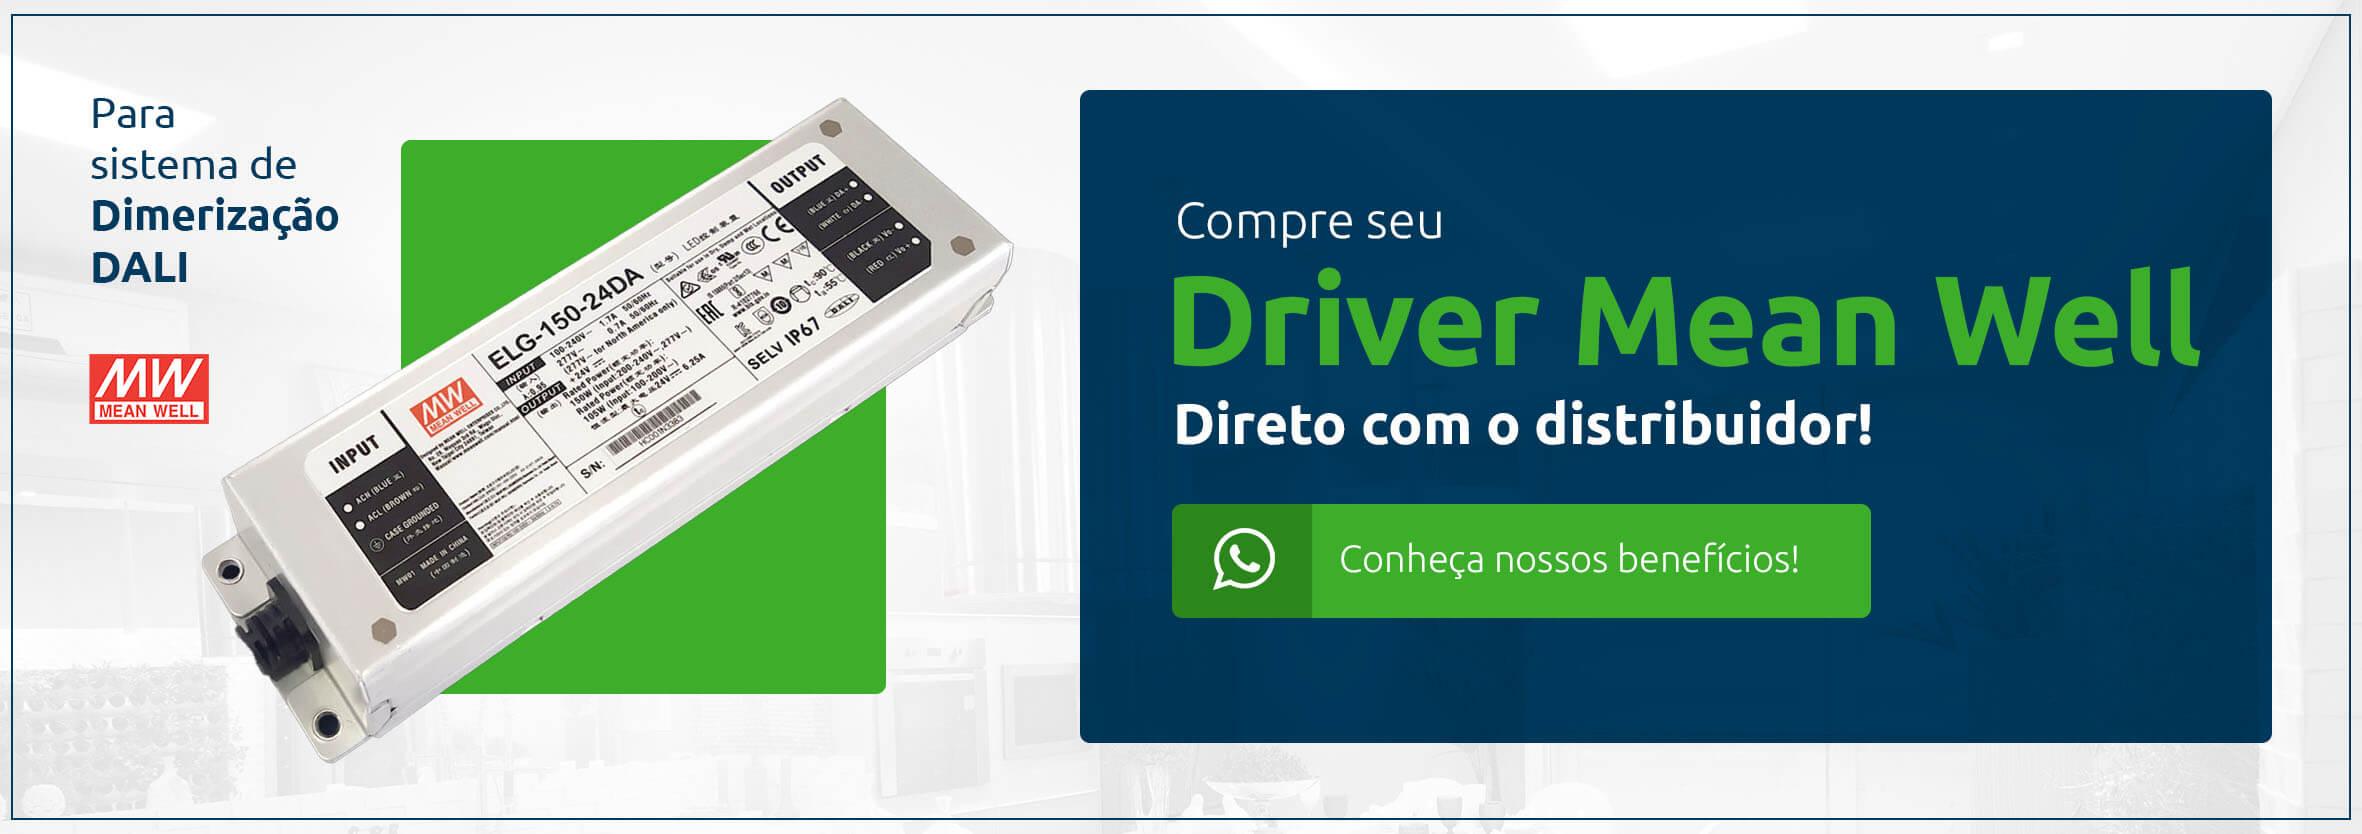 Drivers Lemca